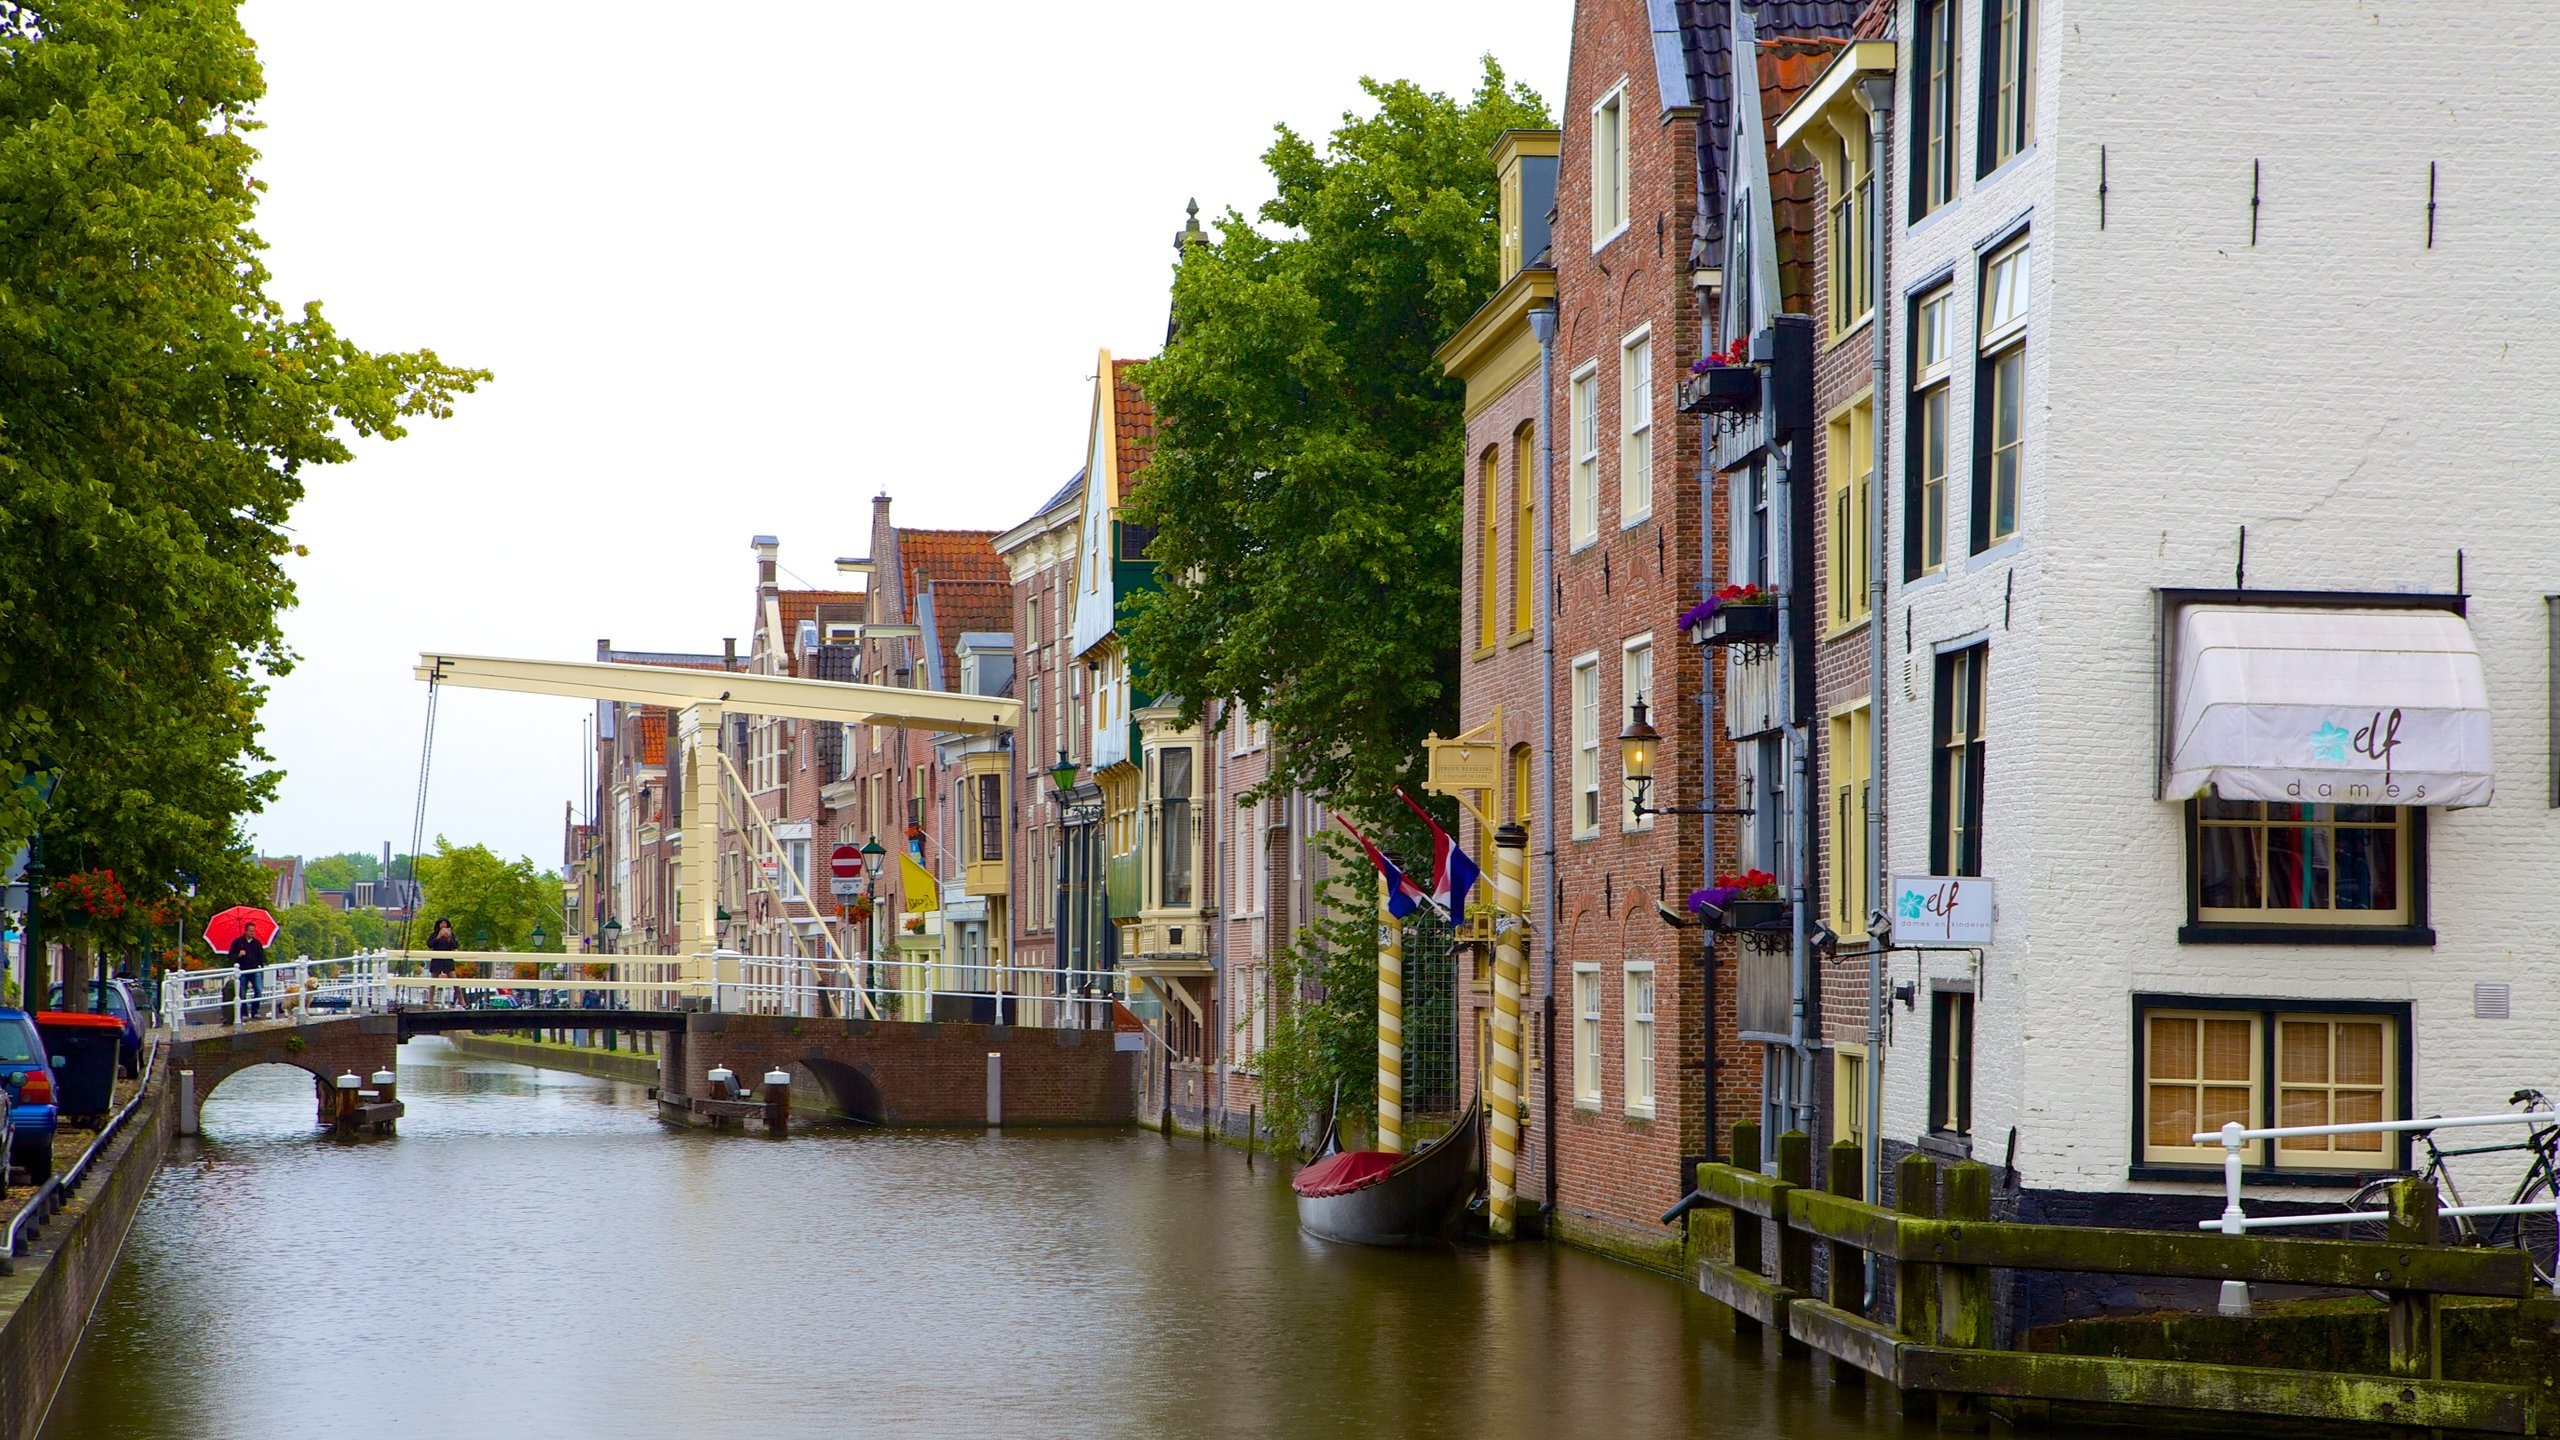 Westfriesland, Nordholland, Niederlande